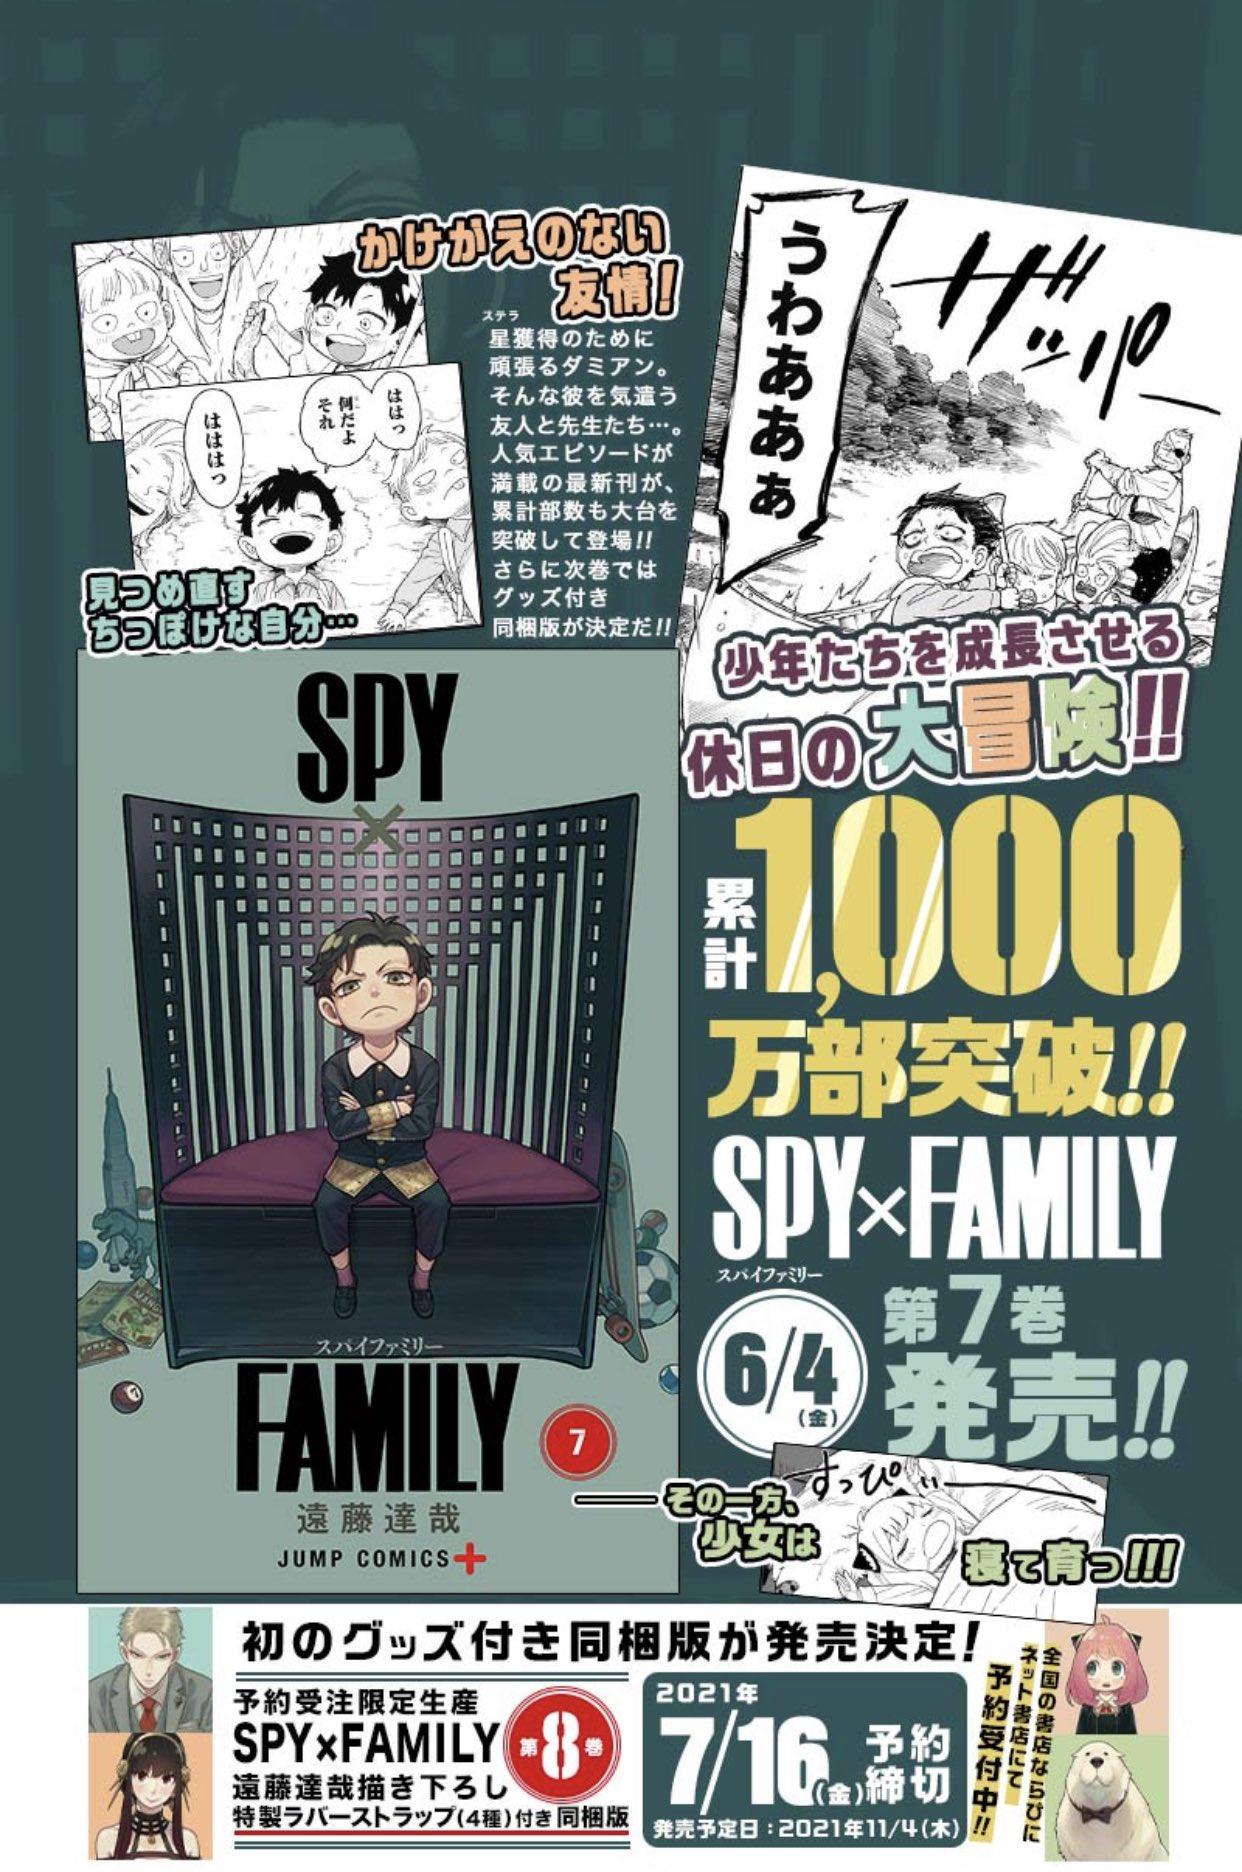 「SPY×FAMILY」累計1000万部を突破!初のグッズ付き同梱版&スピンオフ小説に期待